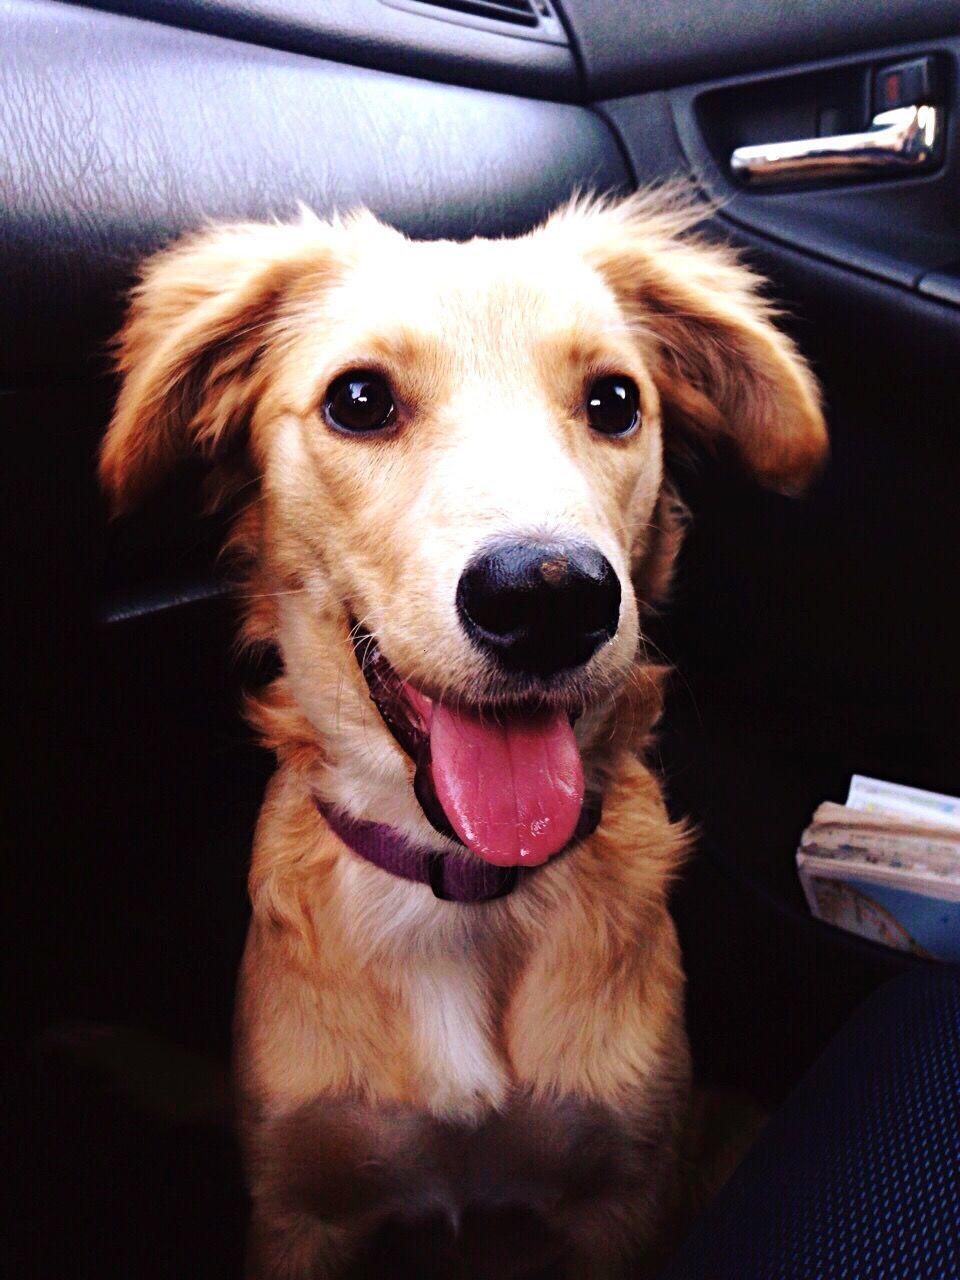 Close-Up Of Cute Dog Sitting In Car